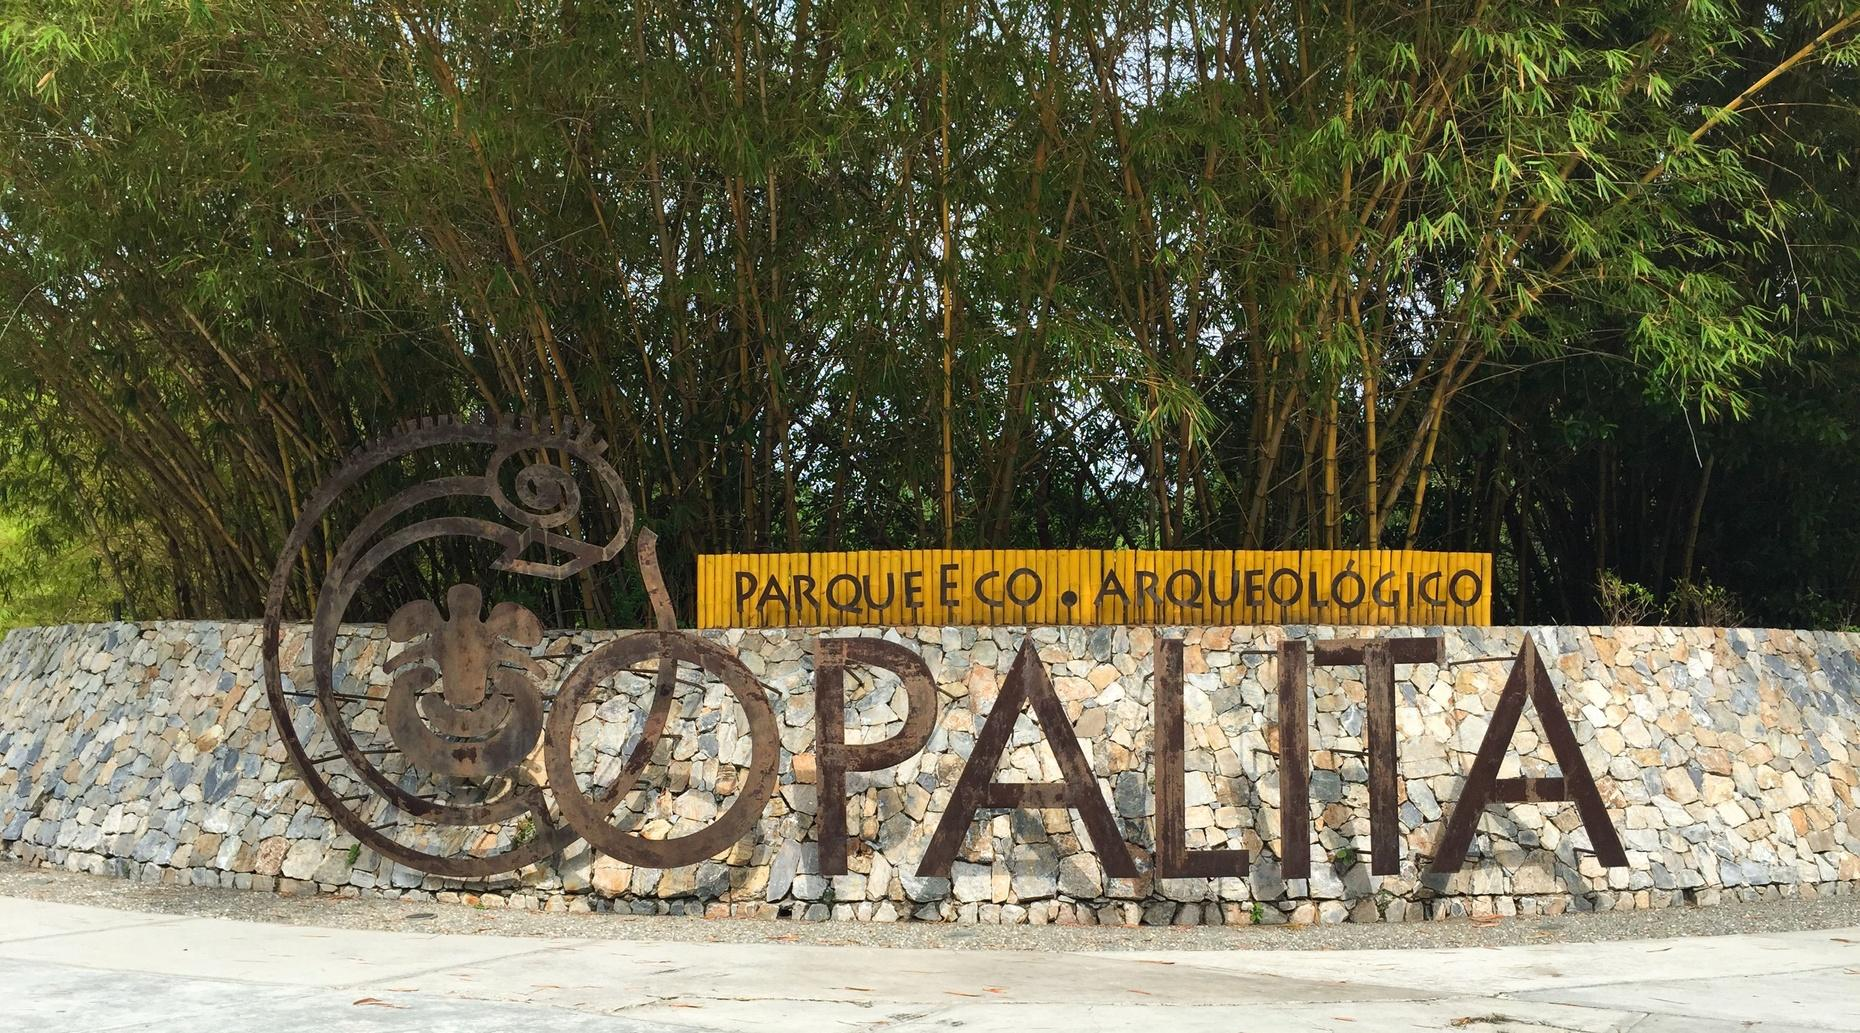 Copalita Eco-Archaeological Park